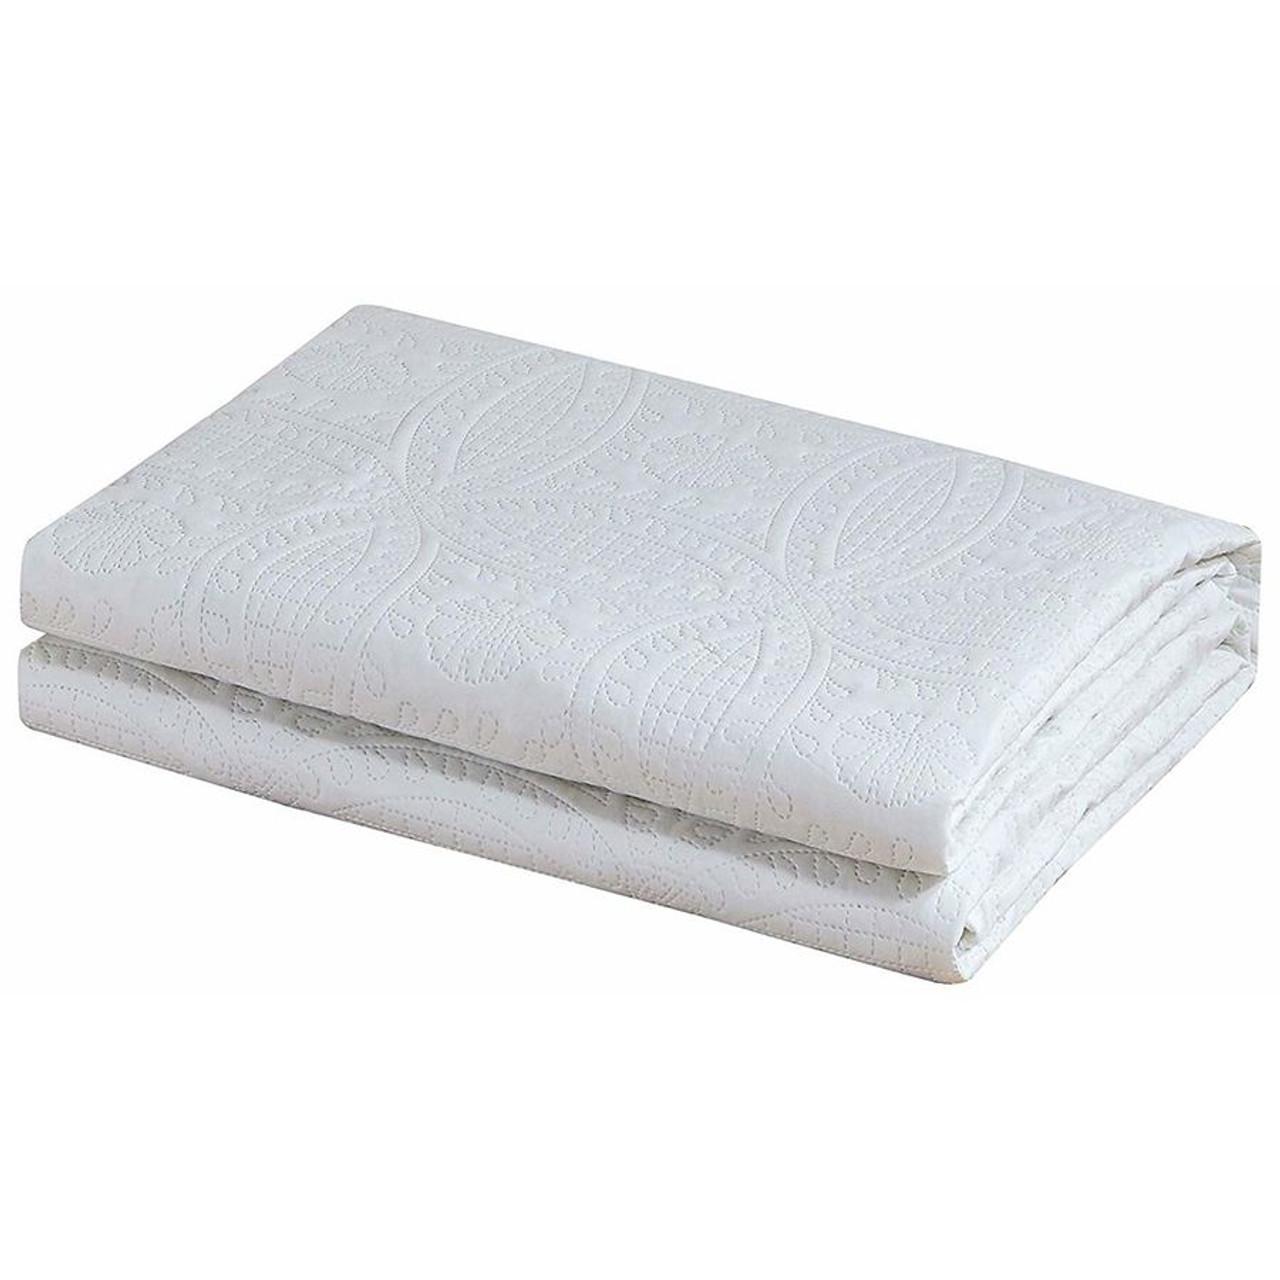 3 Pc Oversized Bedspread Coverlet Set White Color in USA, California, NY, New York City, Los Angeles, San Francisco, Pennsylvania, Washington DC, Virginia and Maryland